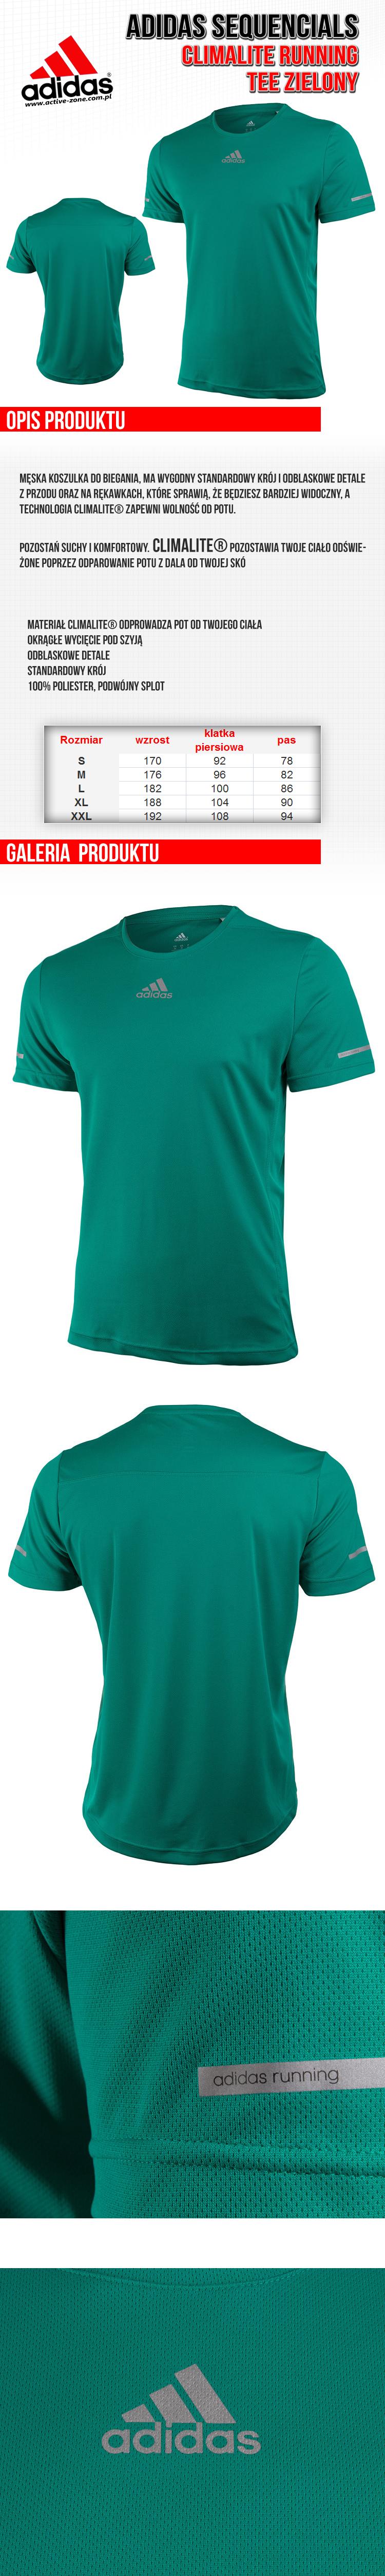 Adidas Sequencials Climalite Running Tee Zielony 1